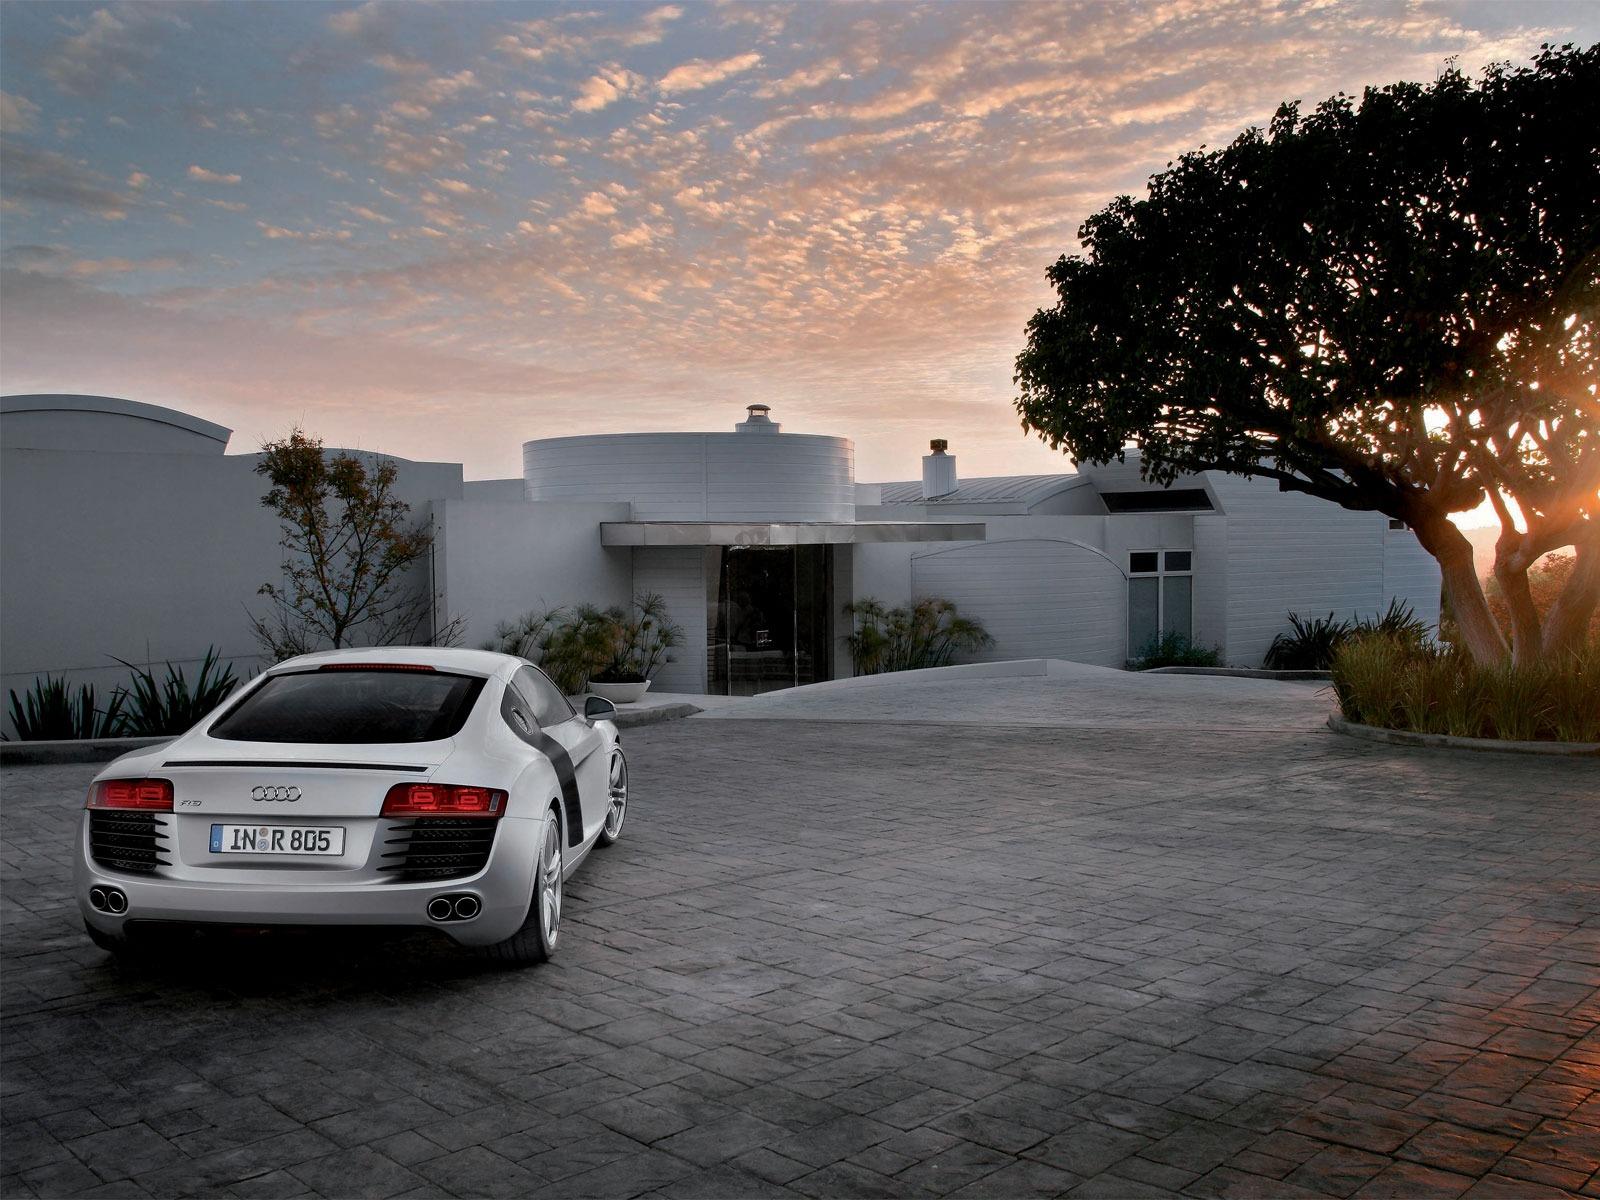 Audi R8 Landscape Wallpaper Audi Cars Wallpapers In Jpg